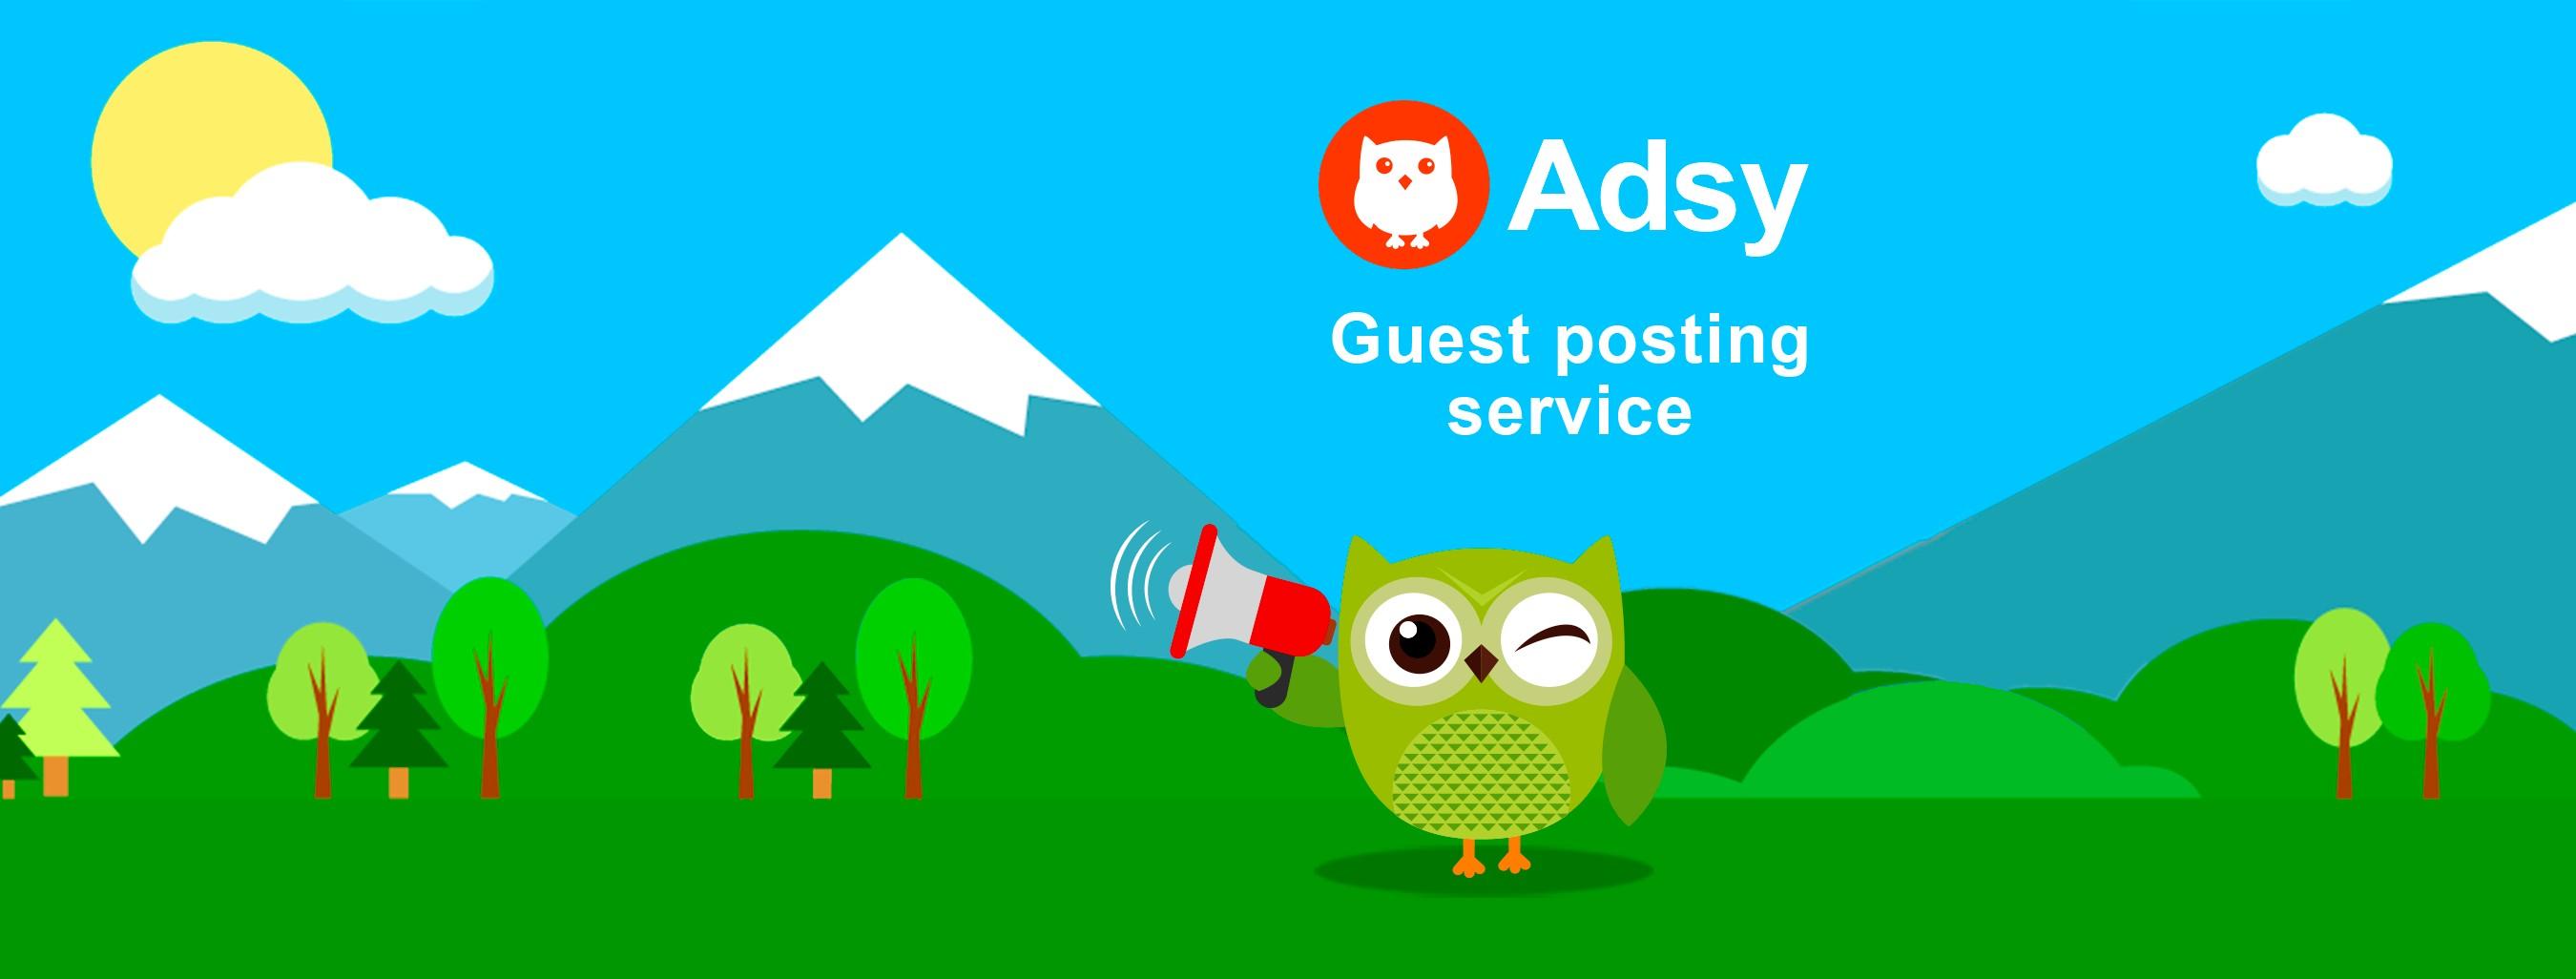 Adsy - Guest Posting Service | LinkedIn